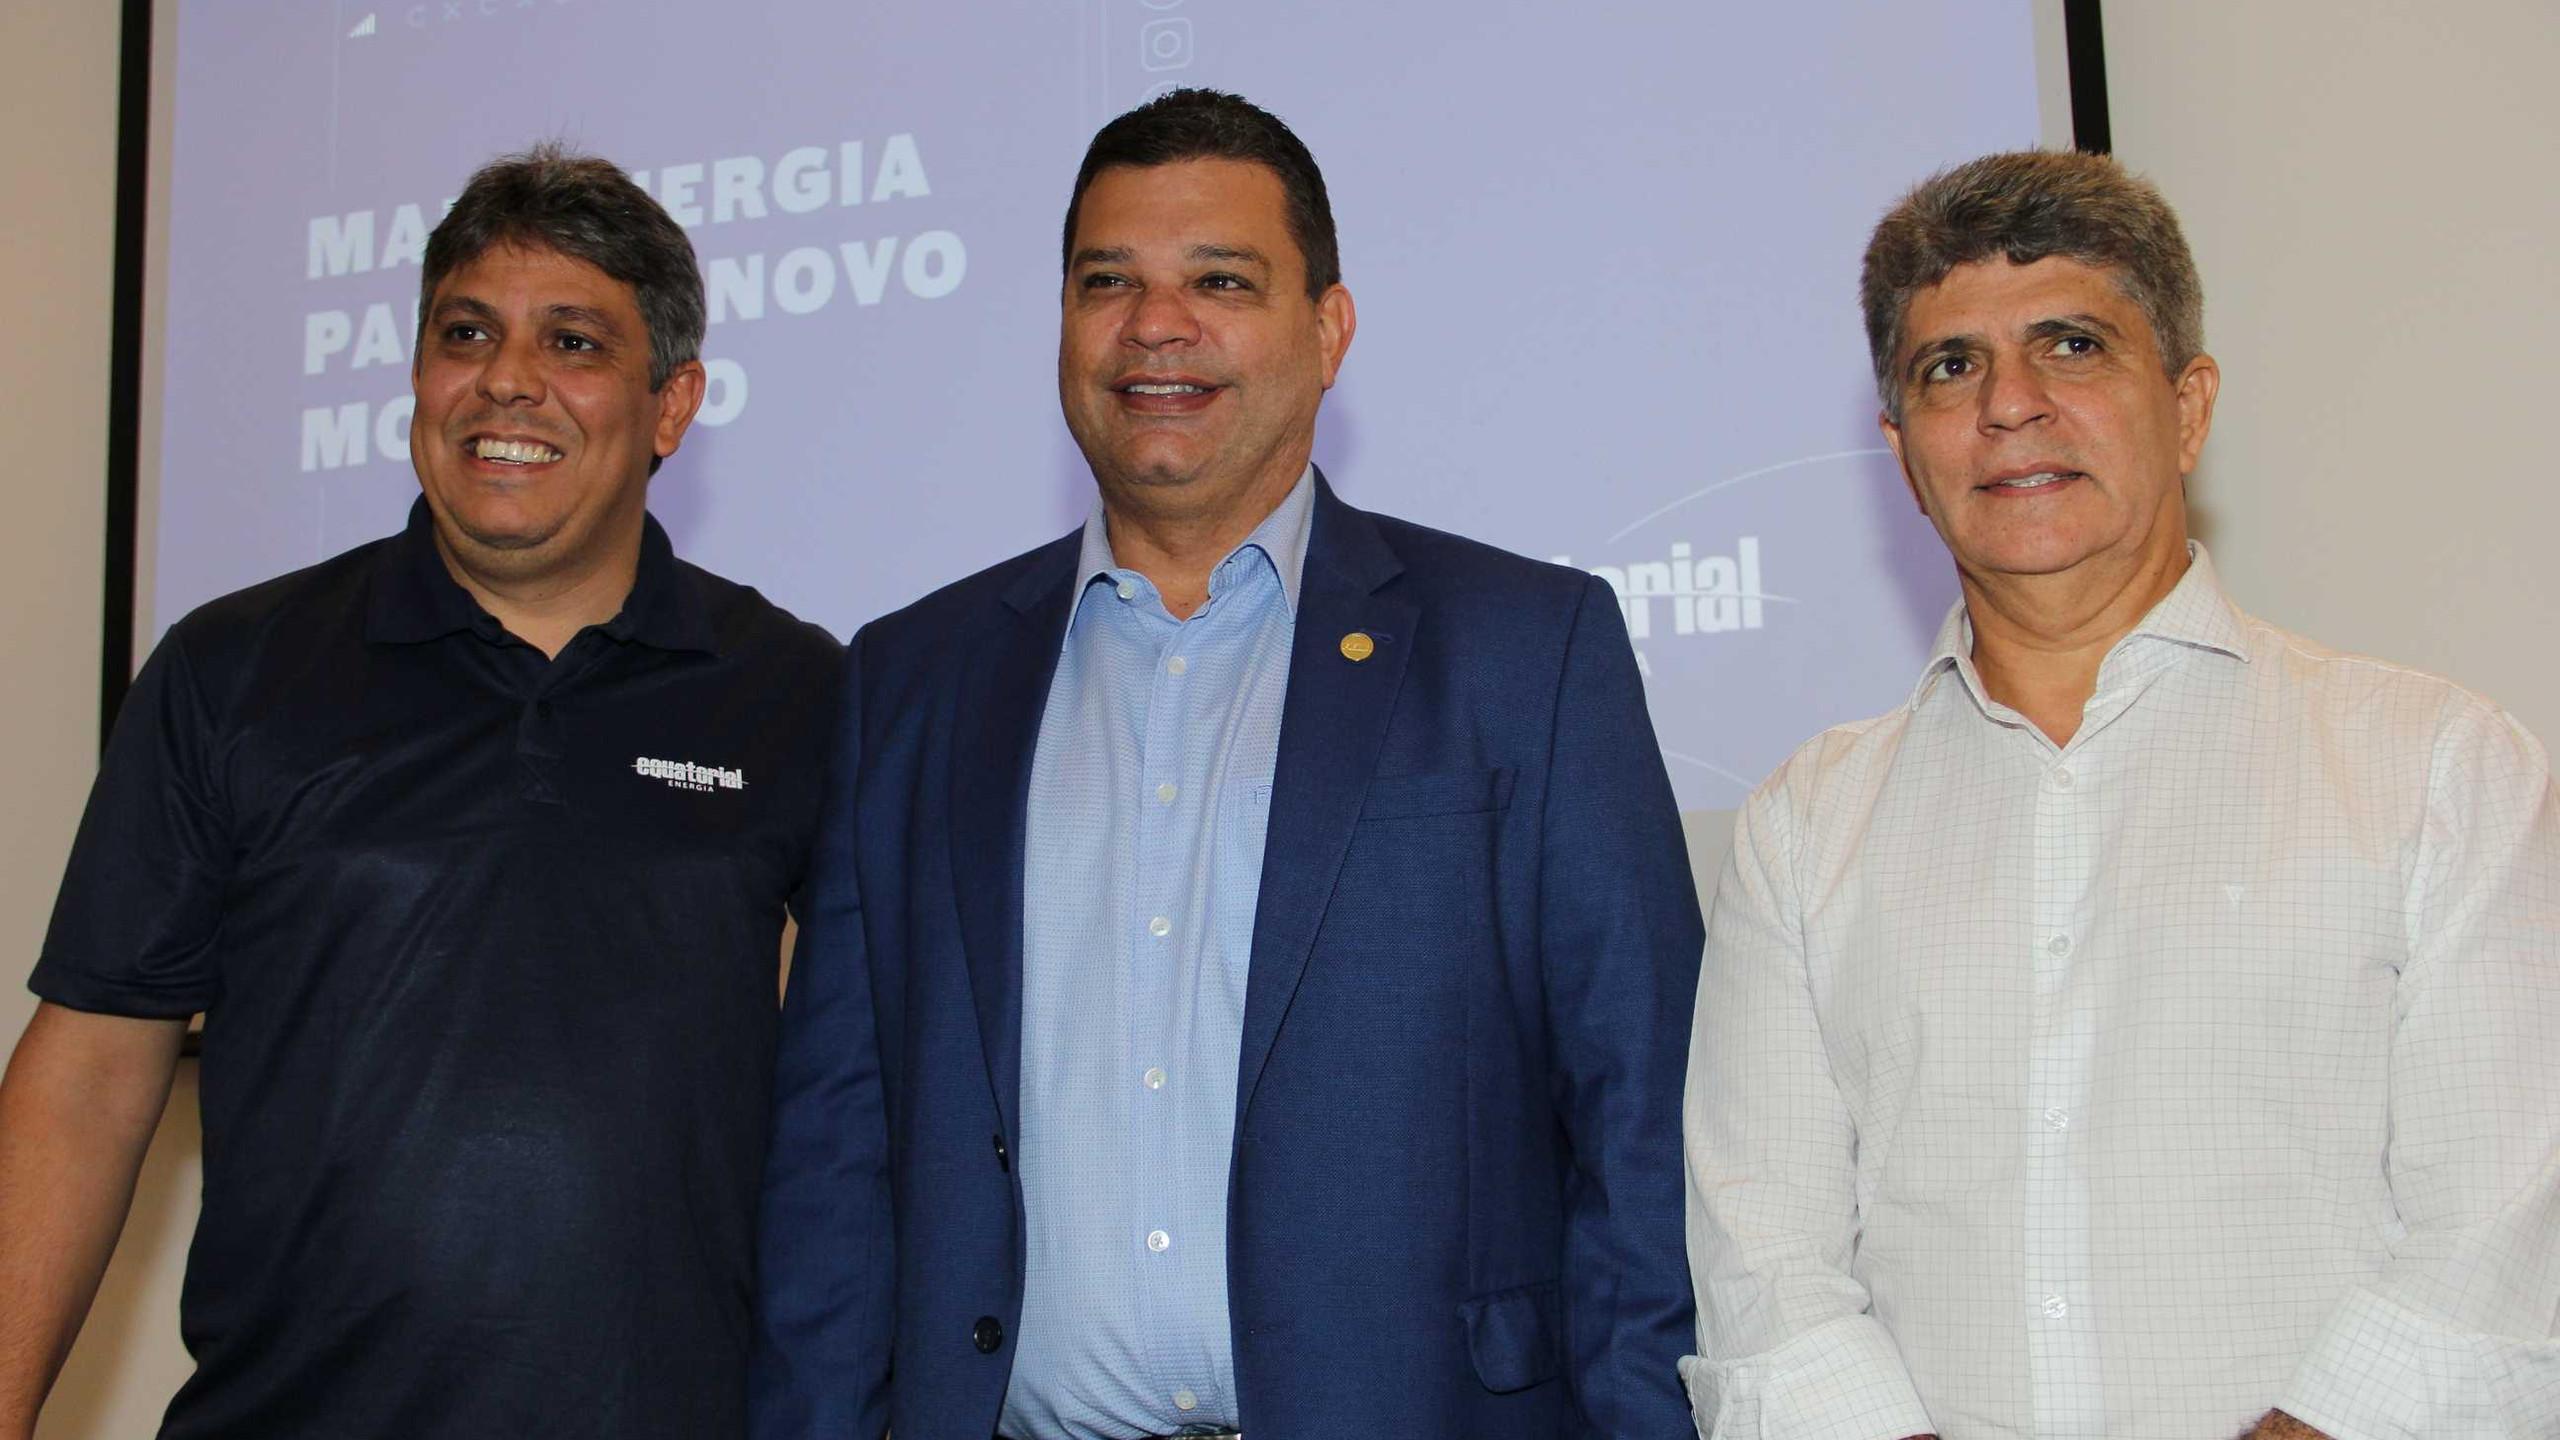 O Pres do Sinduscom – MA entre Augusto Dantas e Augusto Miranda.